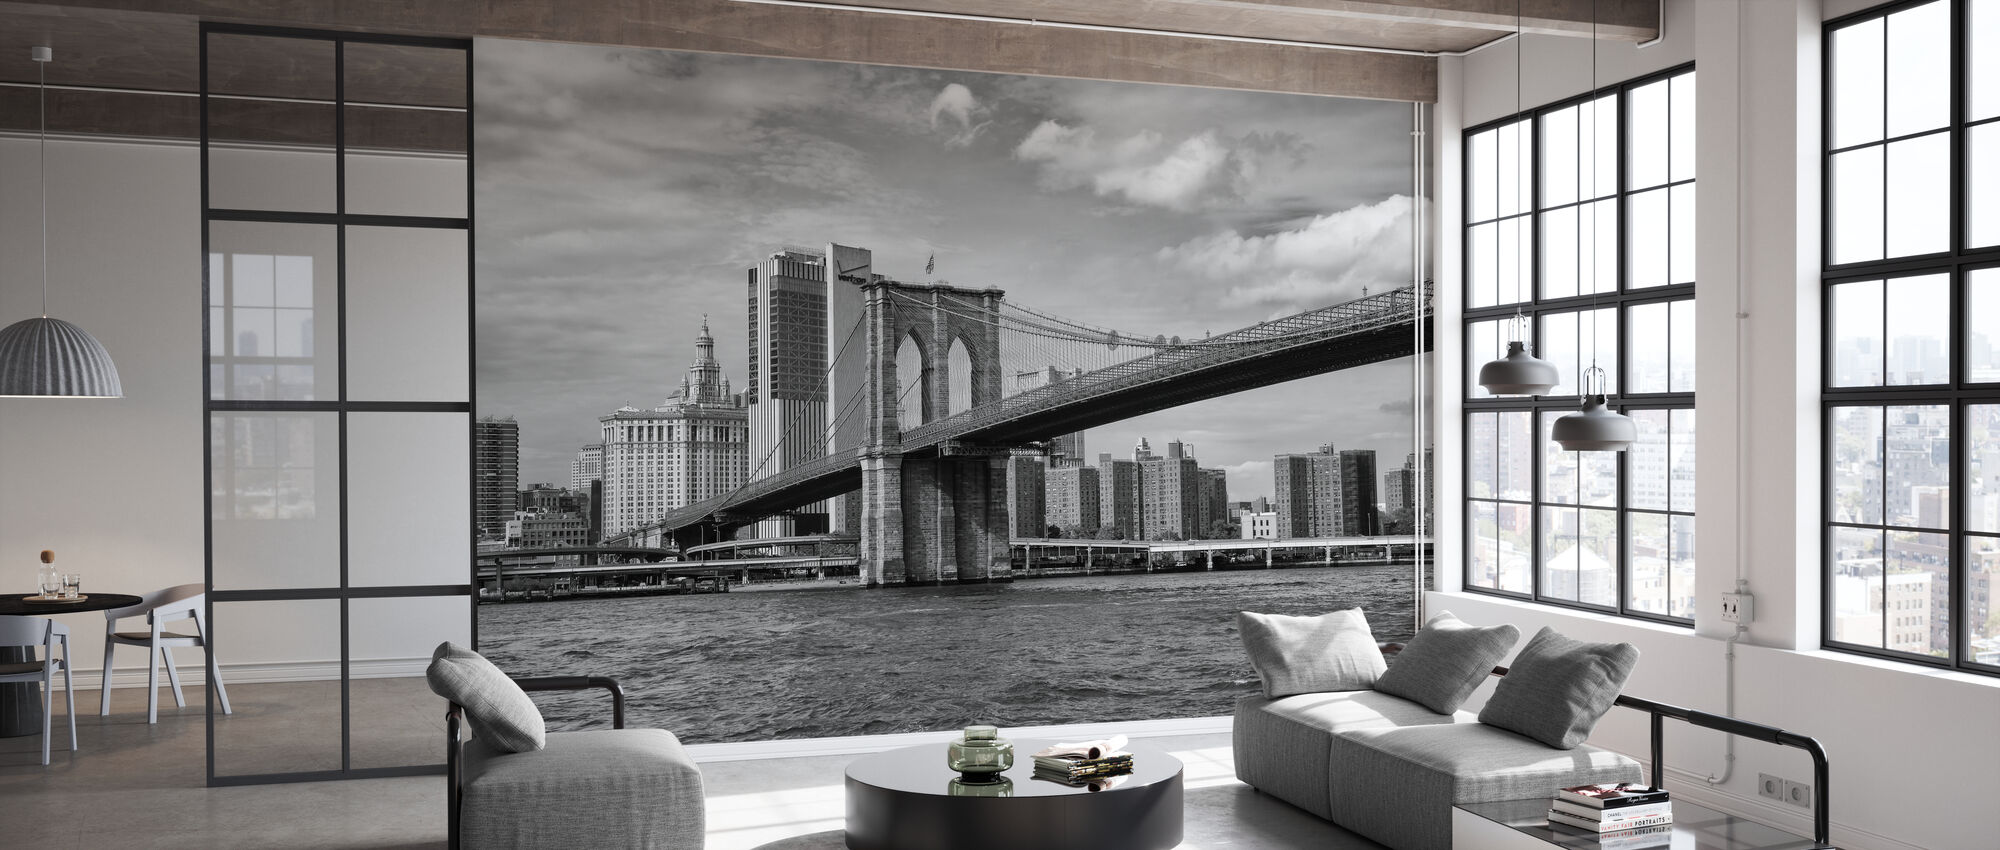 Bridge - Wallpaper - Office